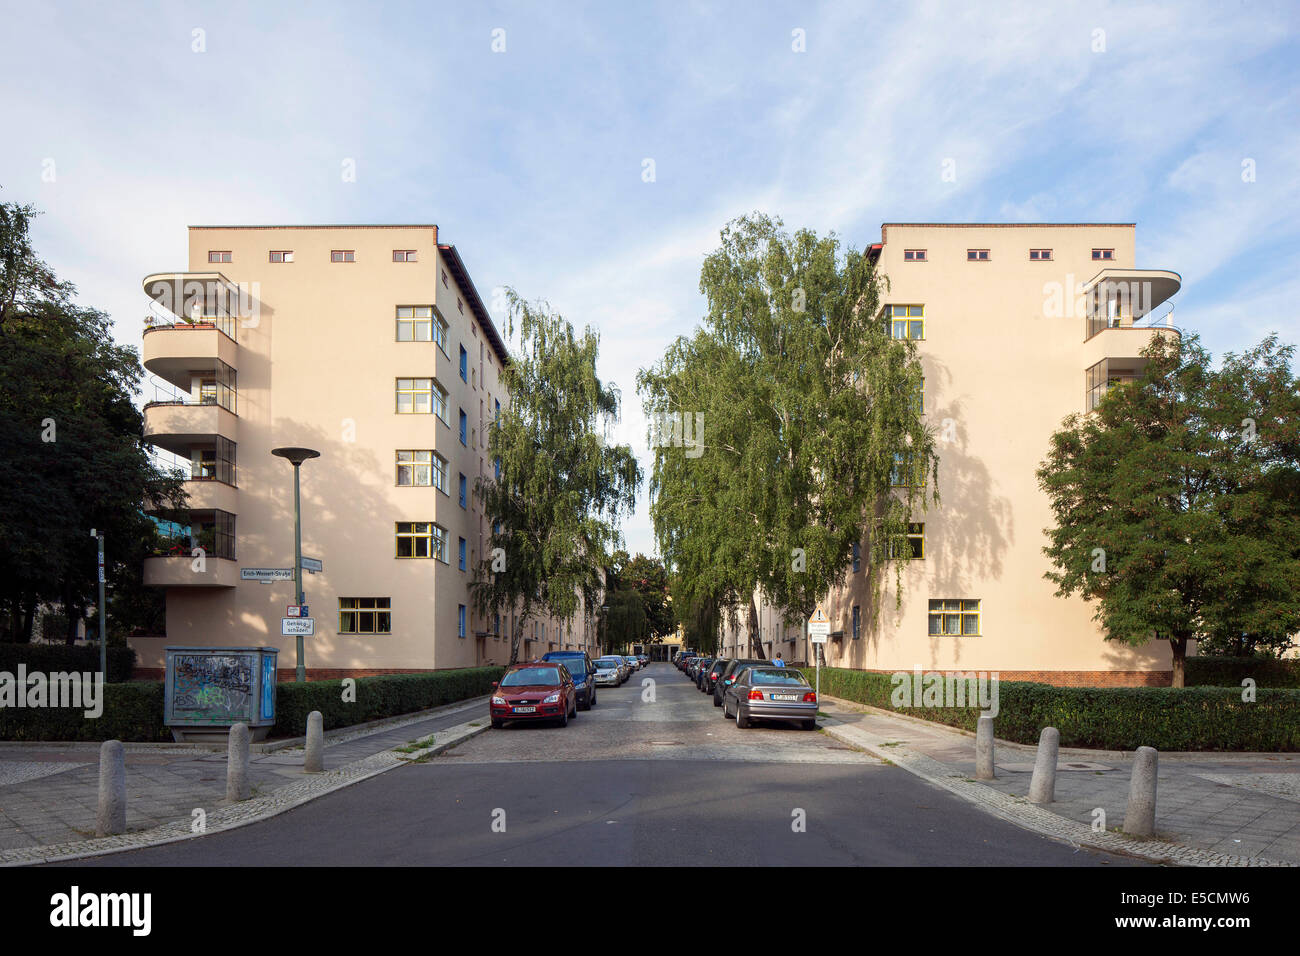 Carl Legien estate, Modernism, New Objectivity, UNESCO World Heritage Site, Prenzlauer Berg, Berlin, Germany - Stock Image